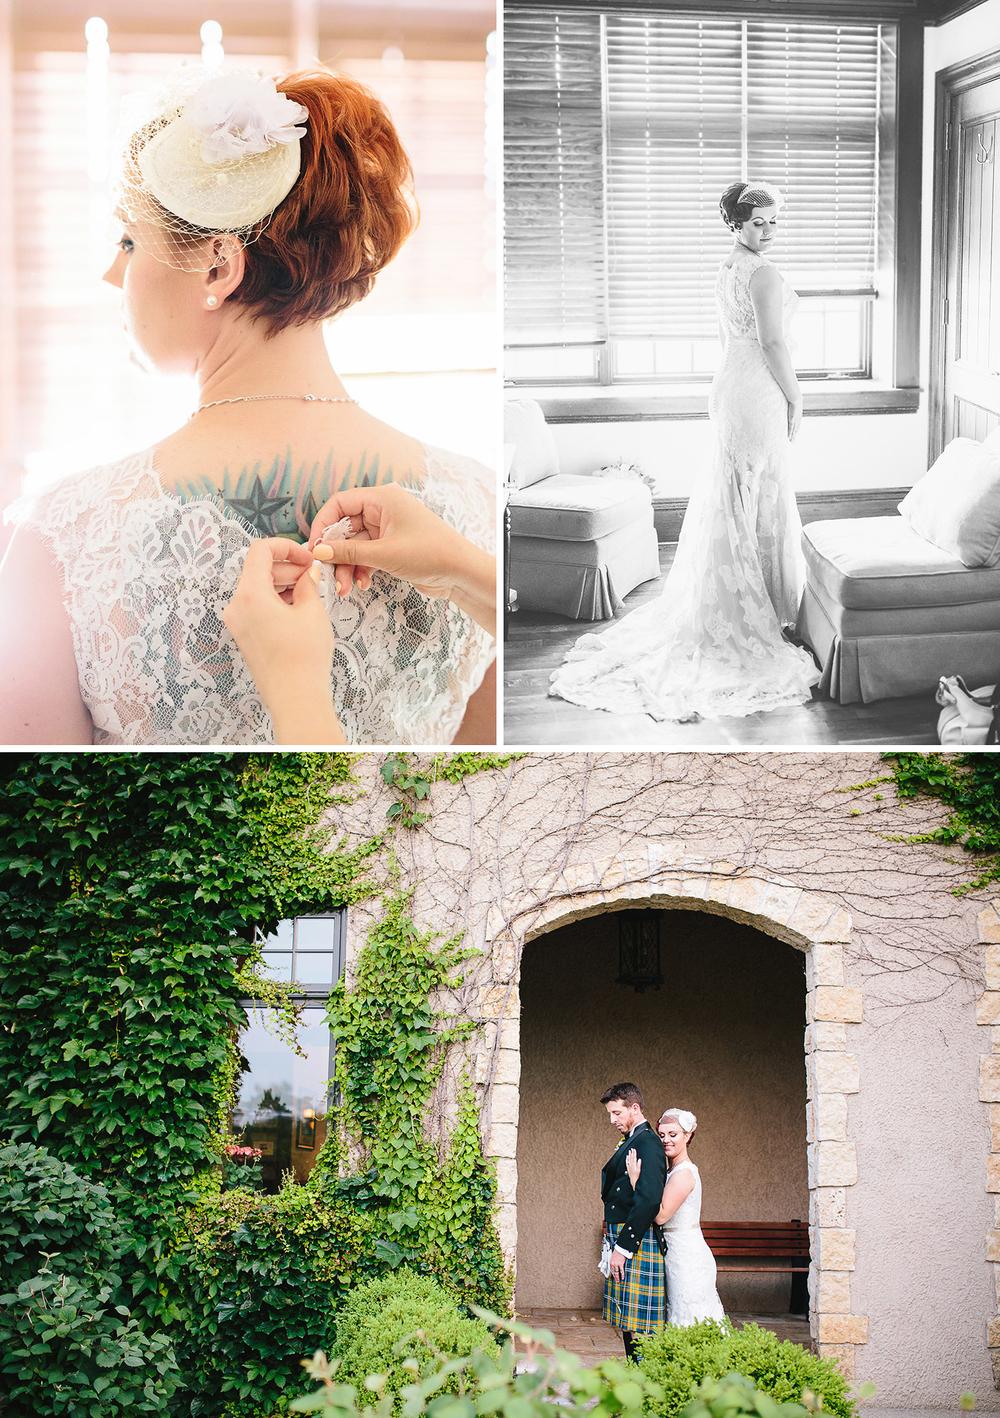 Chicago_Fine_Art_Wedding_Photography_mccann.jpg